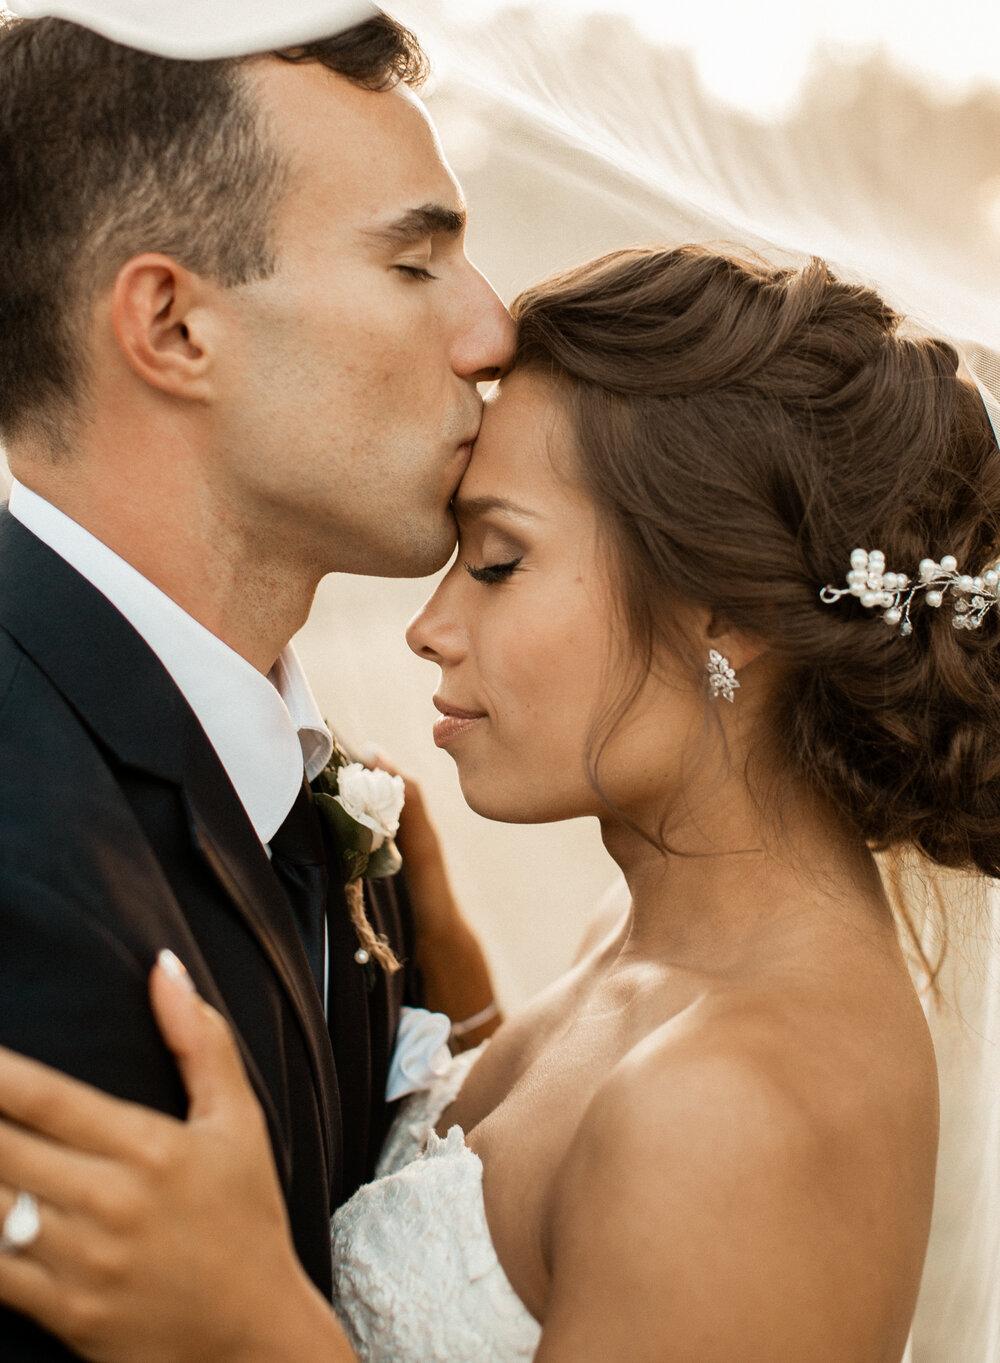 A Joyful Summer Wedding | Sydney + Christian | Noblesville, Indiana